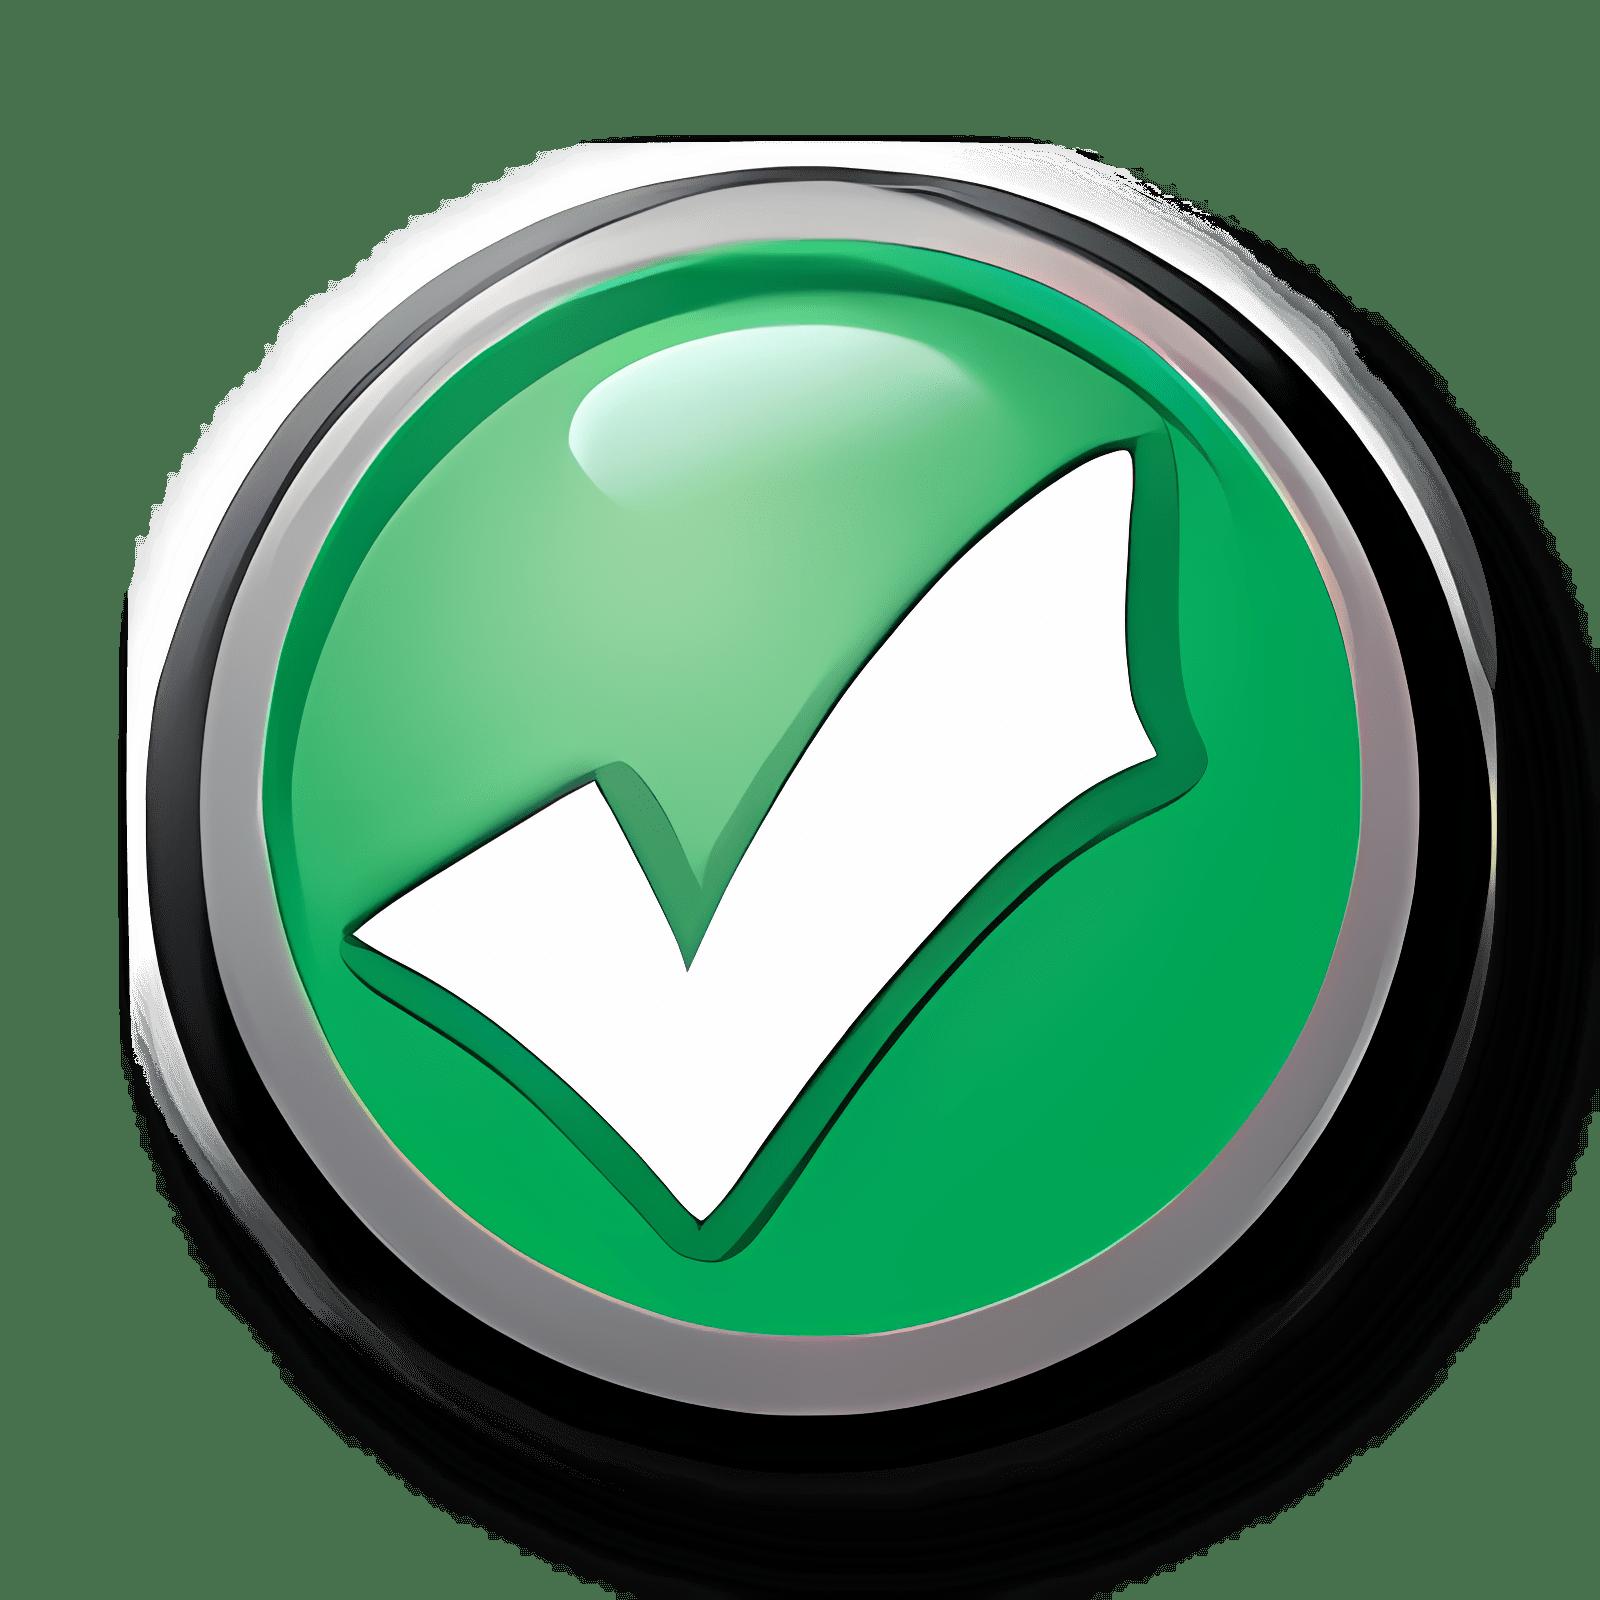 McAfee SiteAdvisor 1.0.158 für Firefox